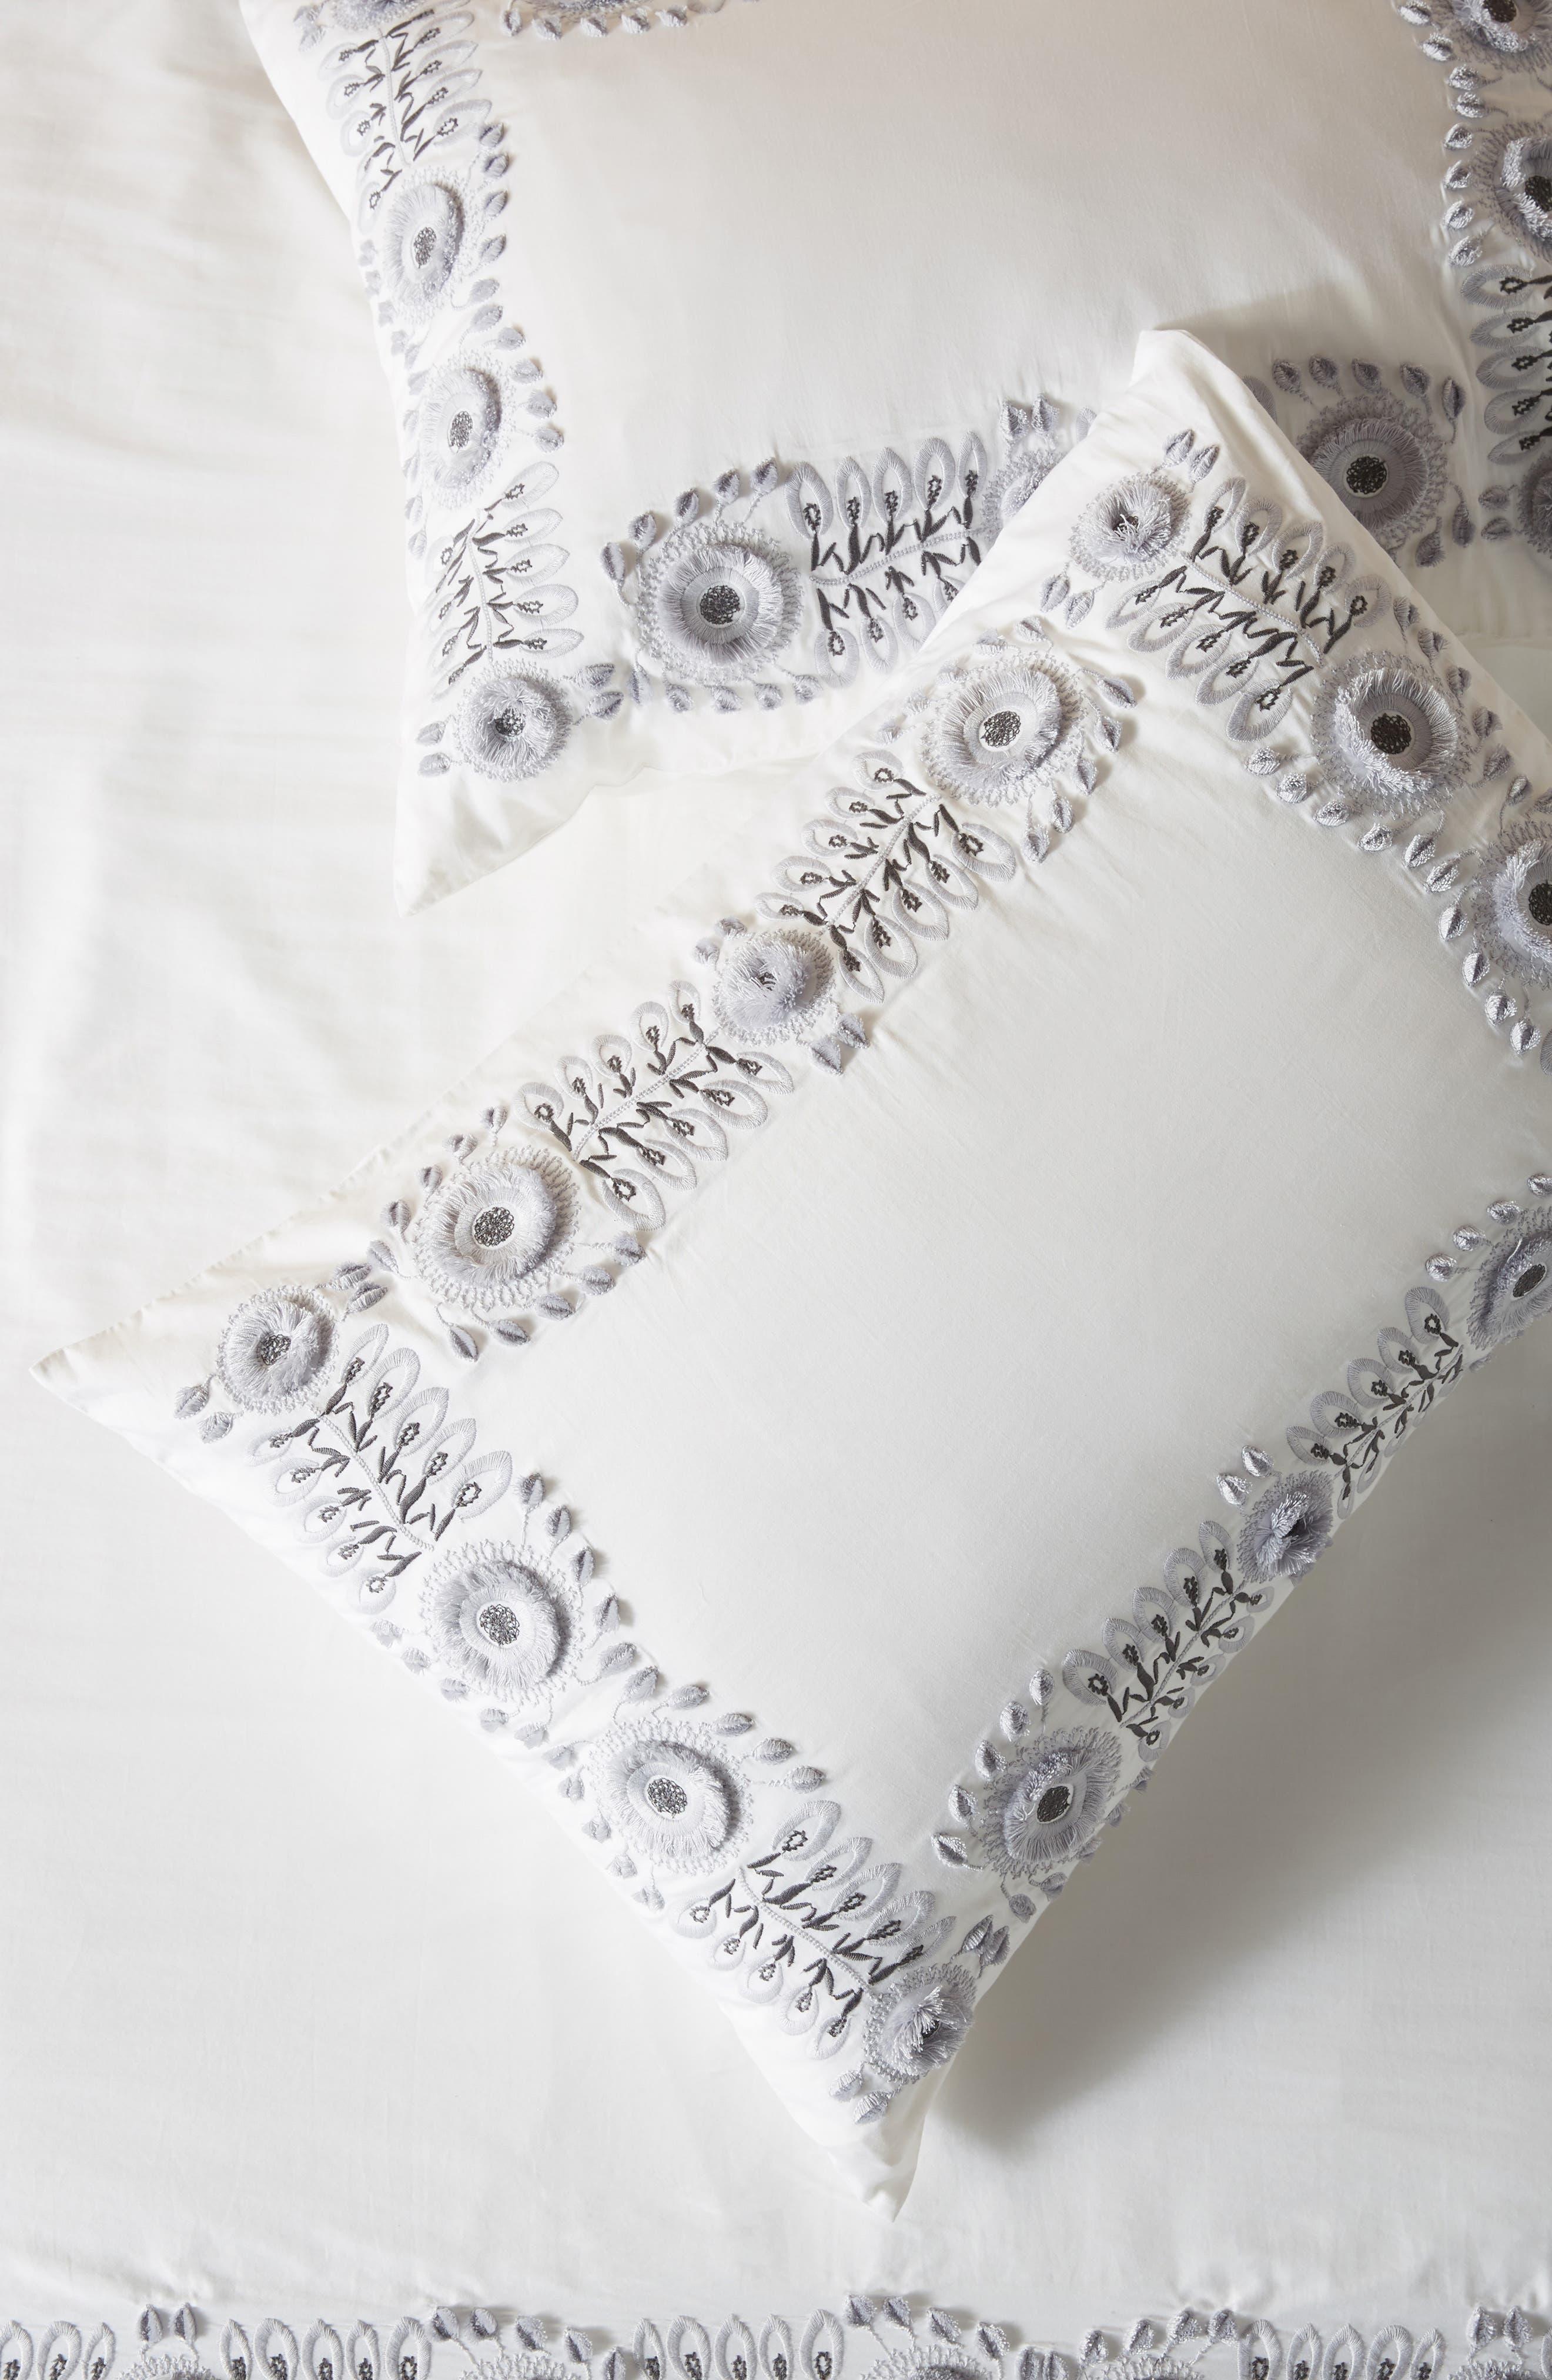 anthropologie petunia set of 2 shams, size standard - white